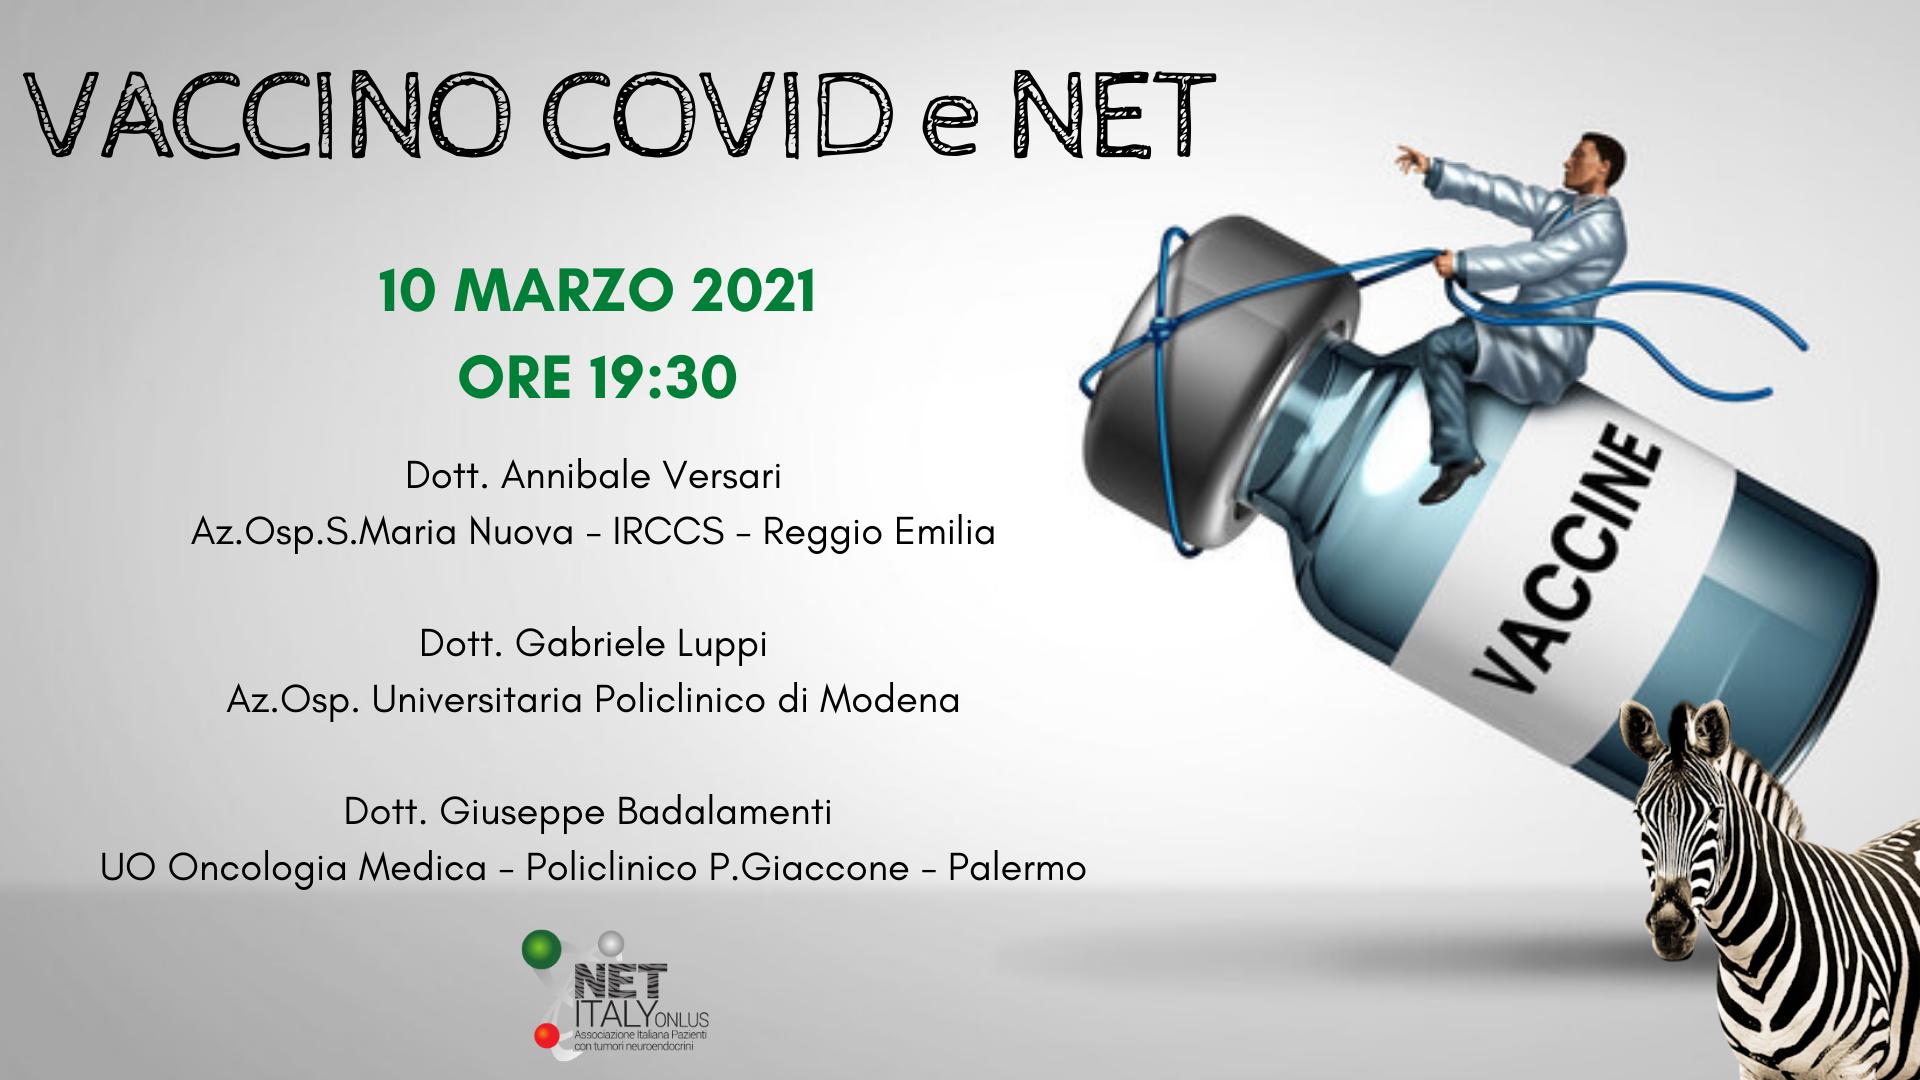 NET Italy Webinar: Vaccino COVID e NET / NET Italy Webinar: COVID Vaccine and NET